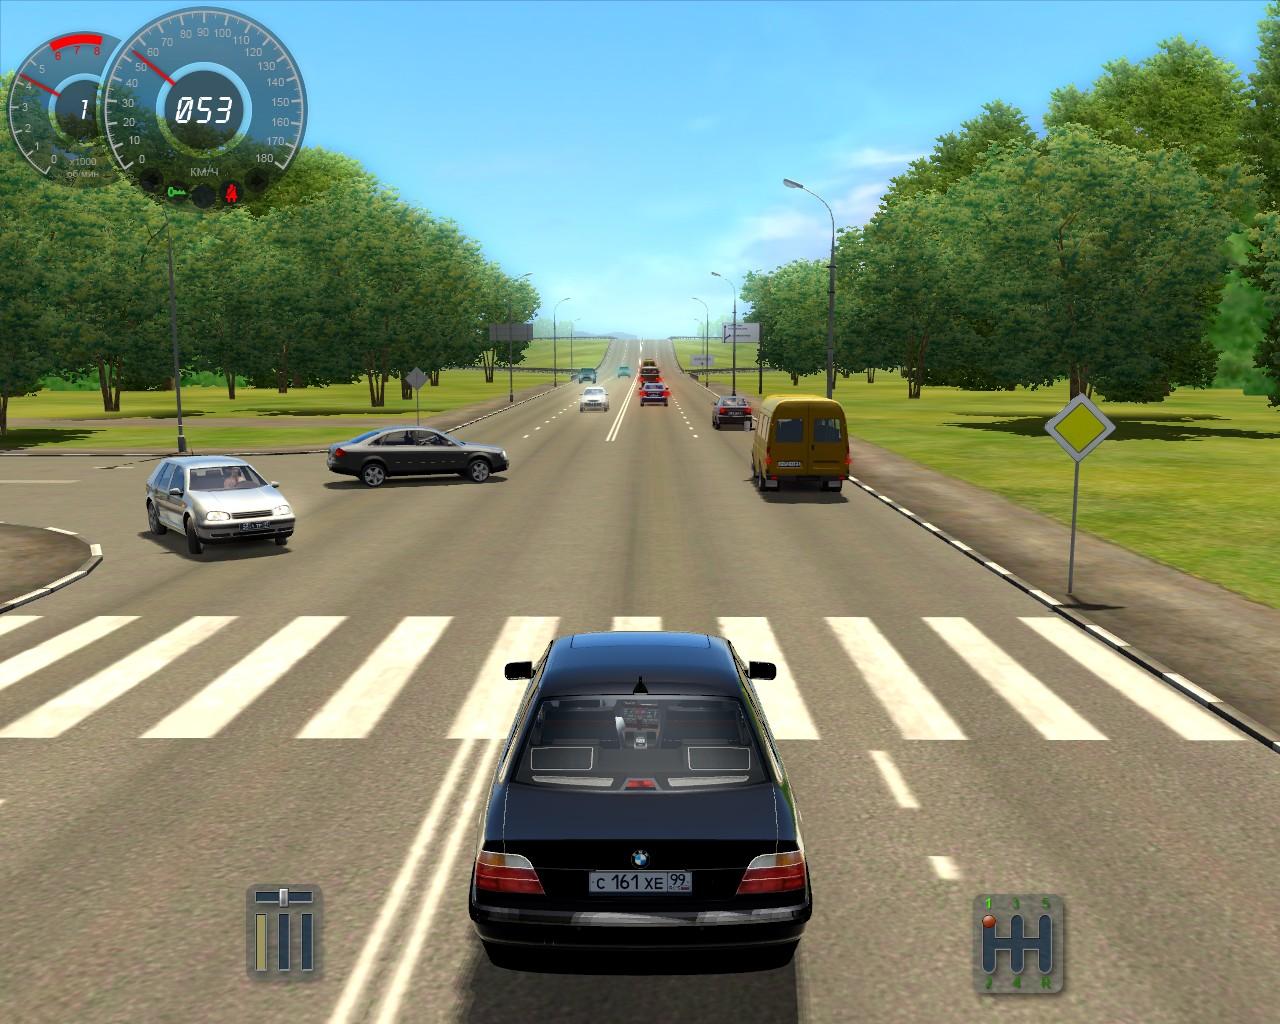 Скриншот 3D Инструктор (2015) PC